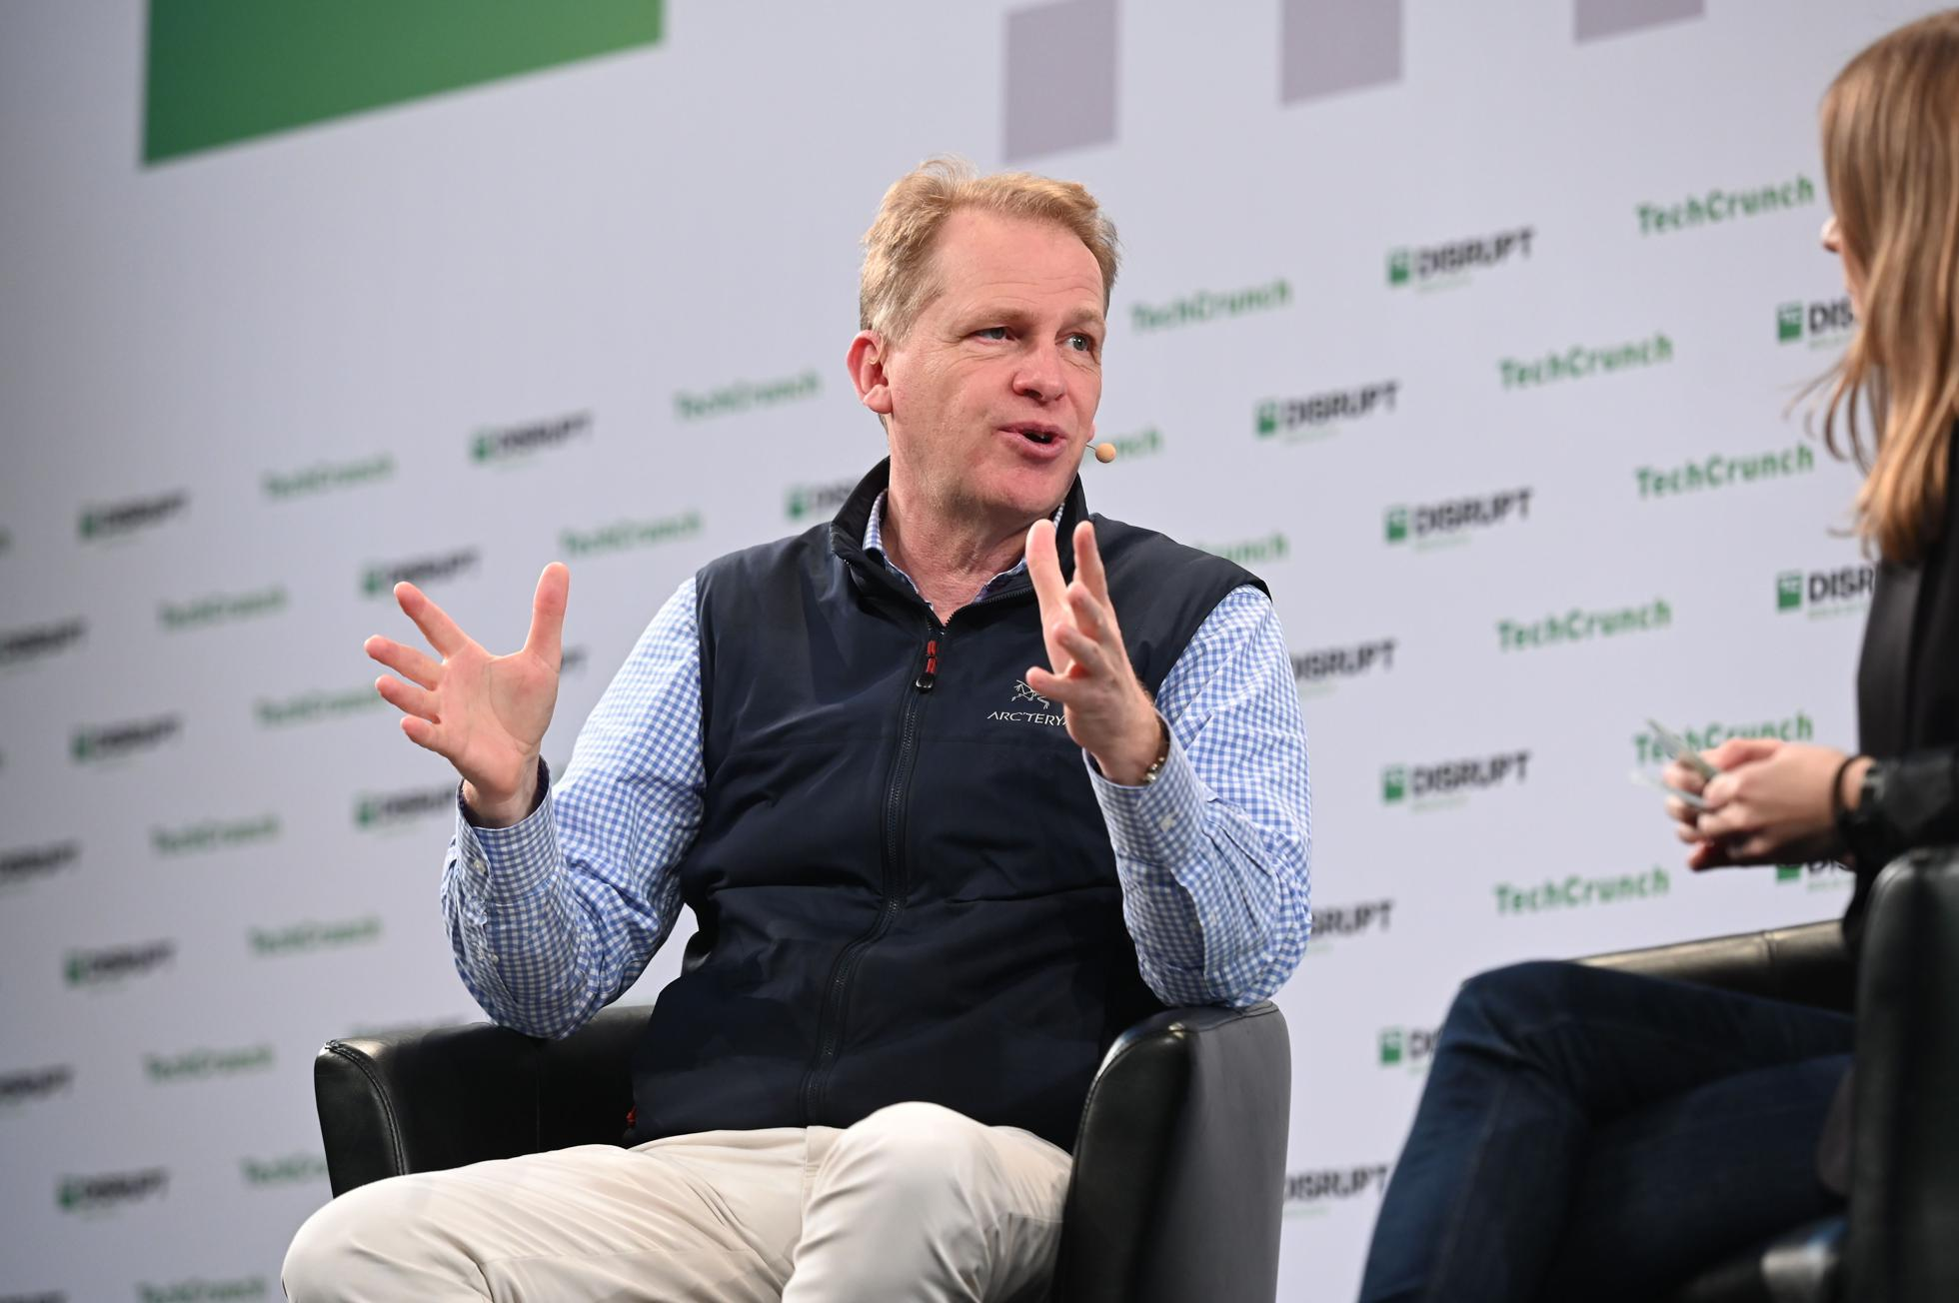 Graphcore CEO Nigel Toon